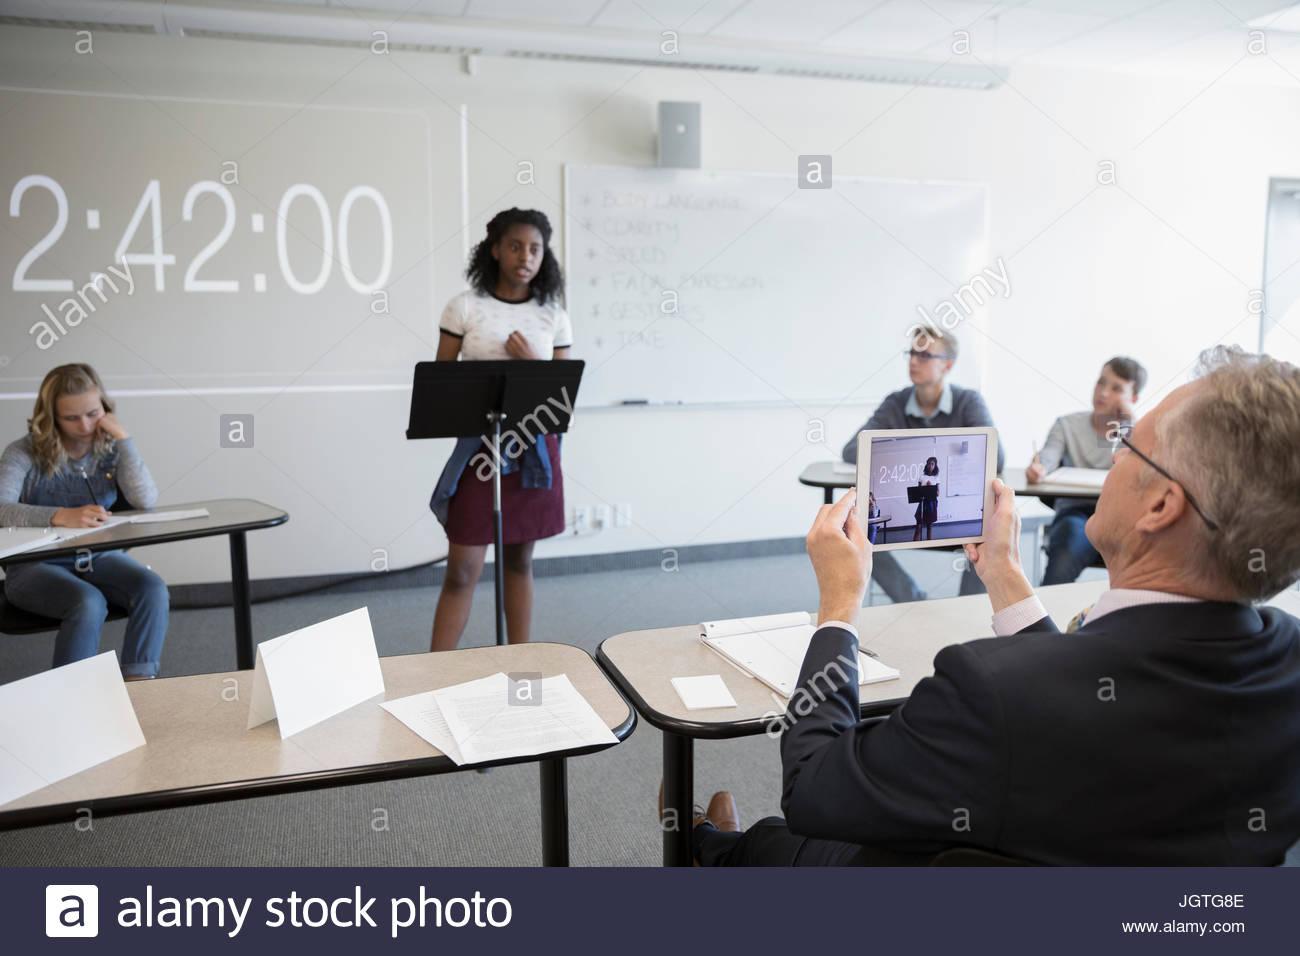 Teacher with digital tablet videoing girl middle school student speaking in debate classroom - Stock Image